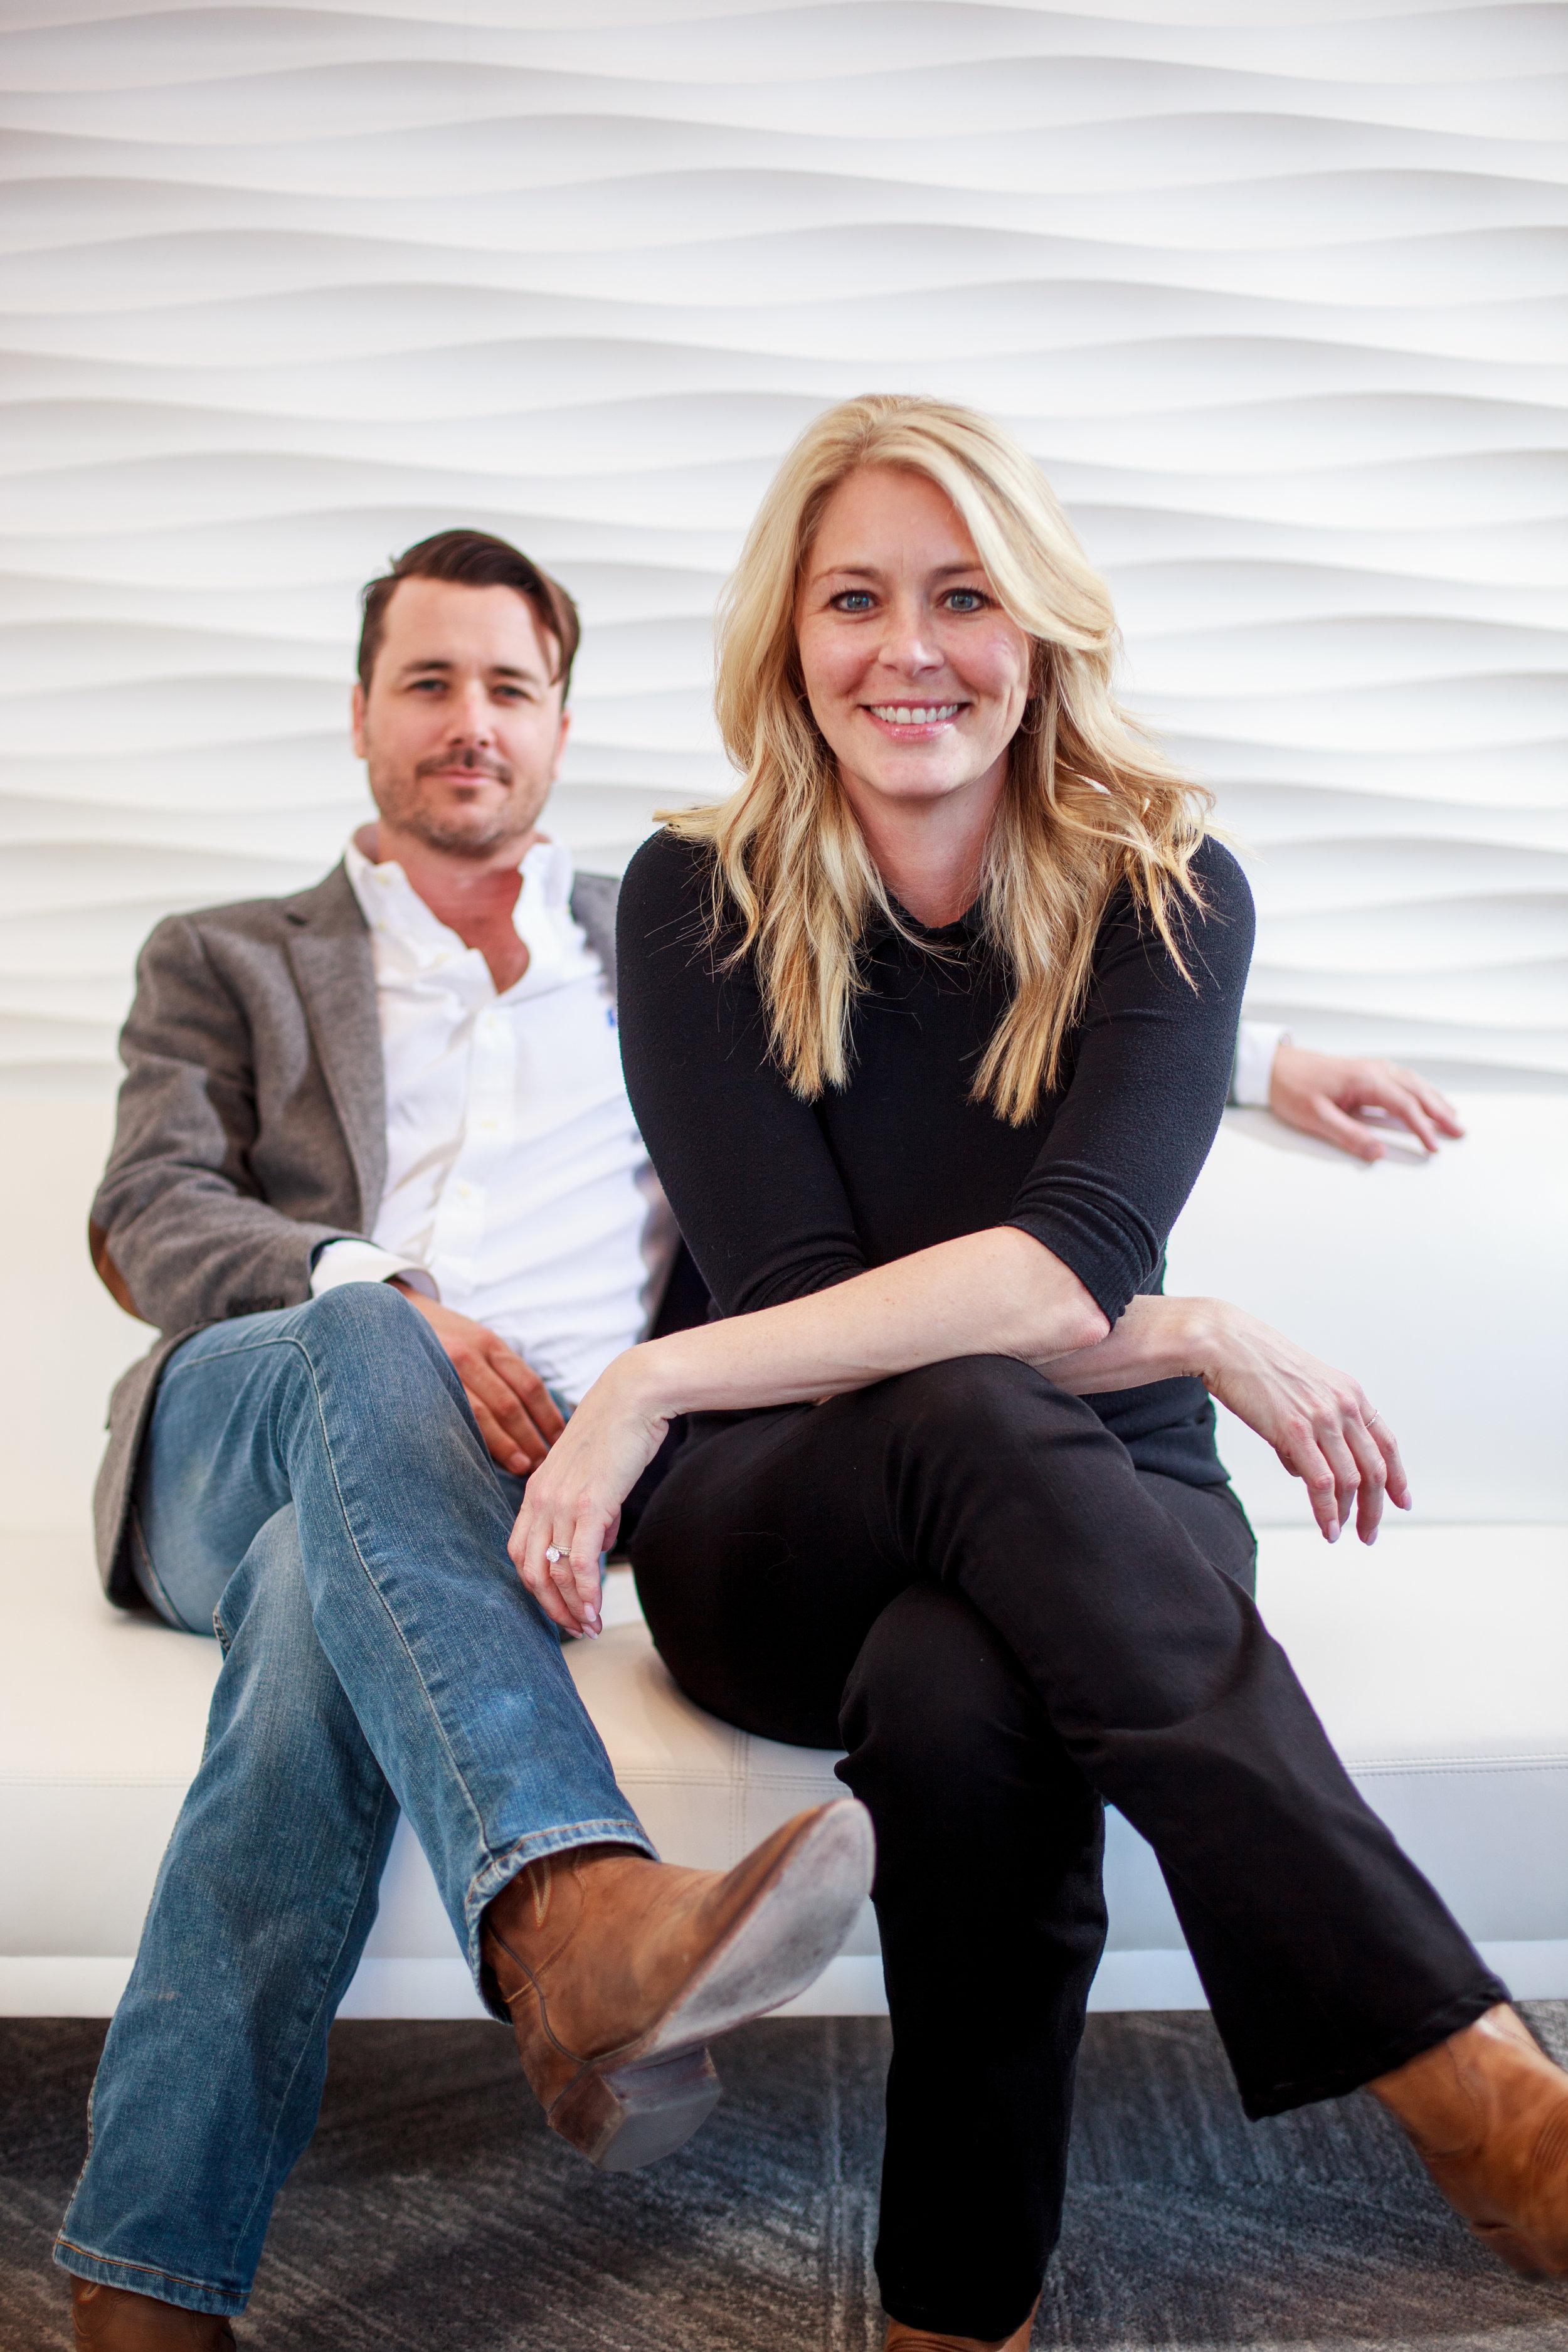 Gary and Angela S. - Southwest Asphalt / Fiber Force by ABC Polymer